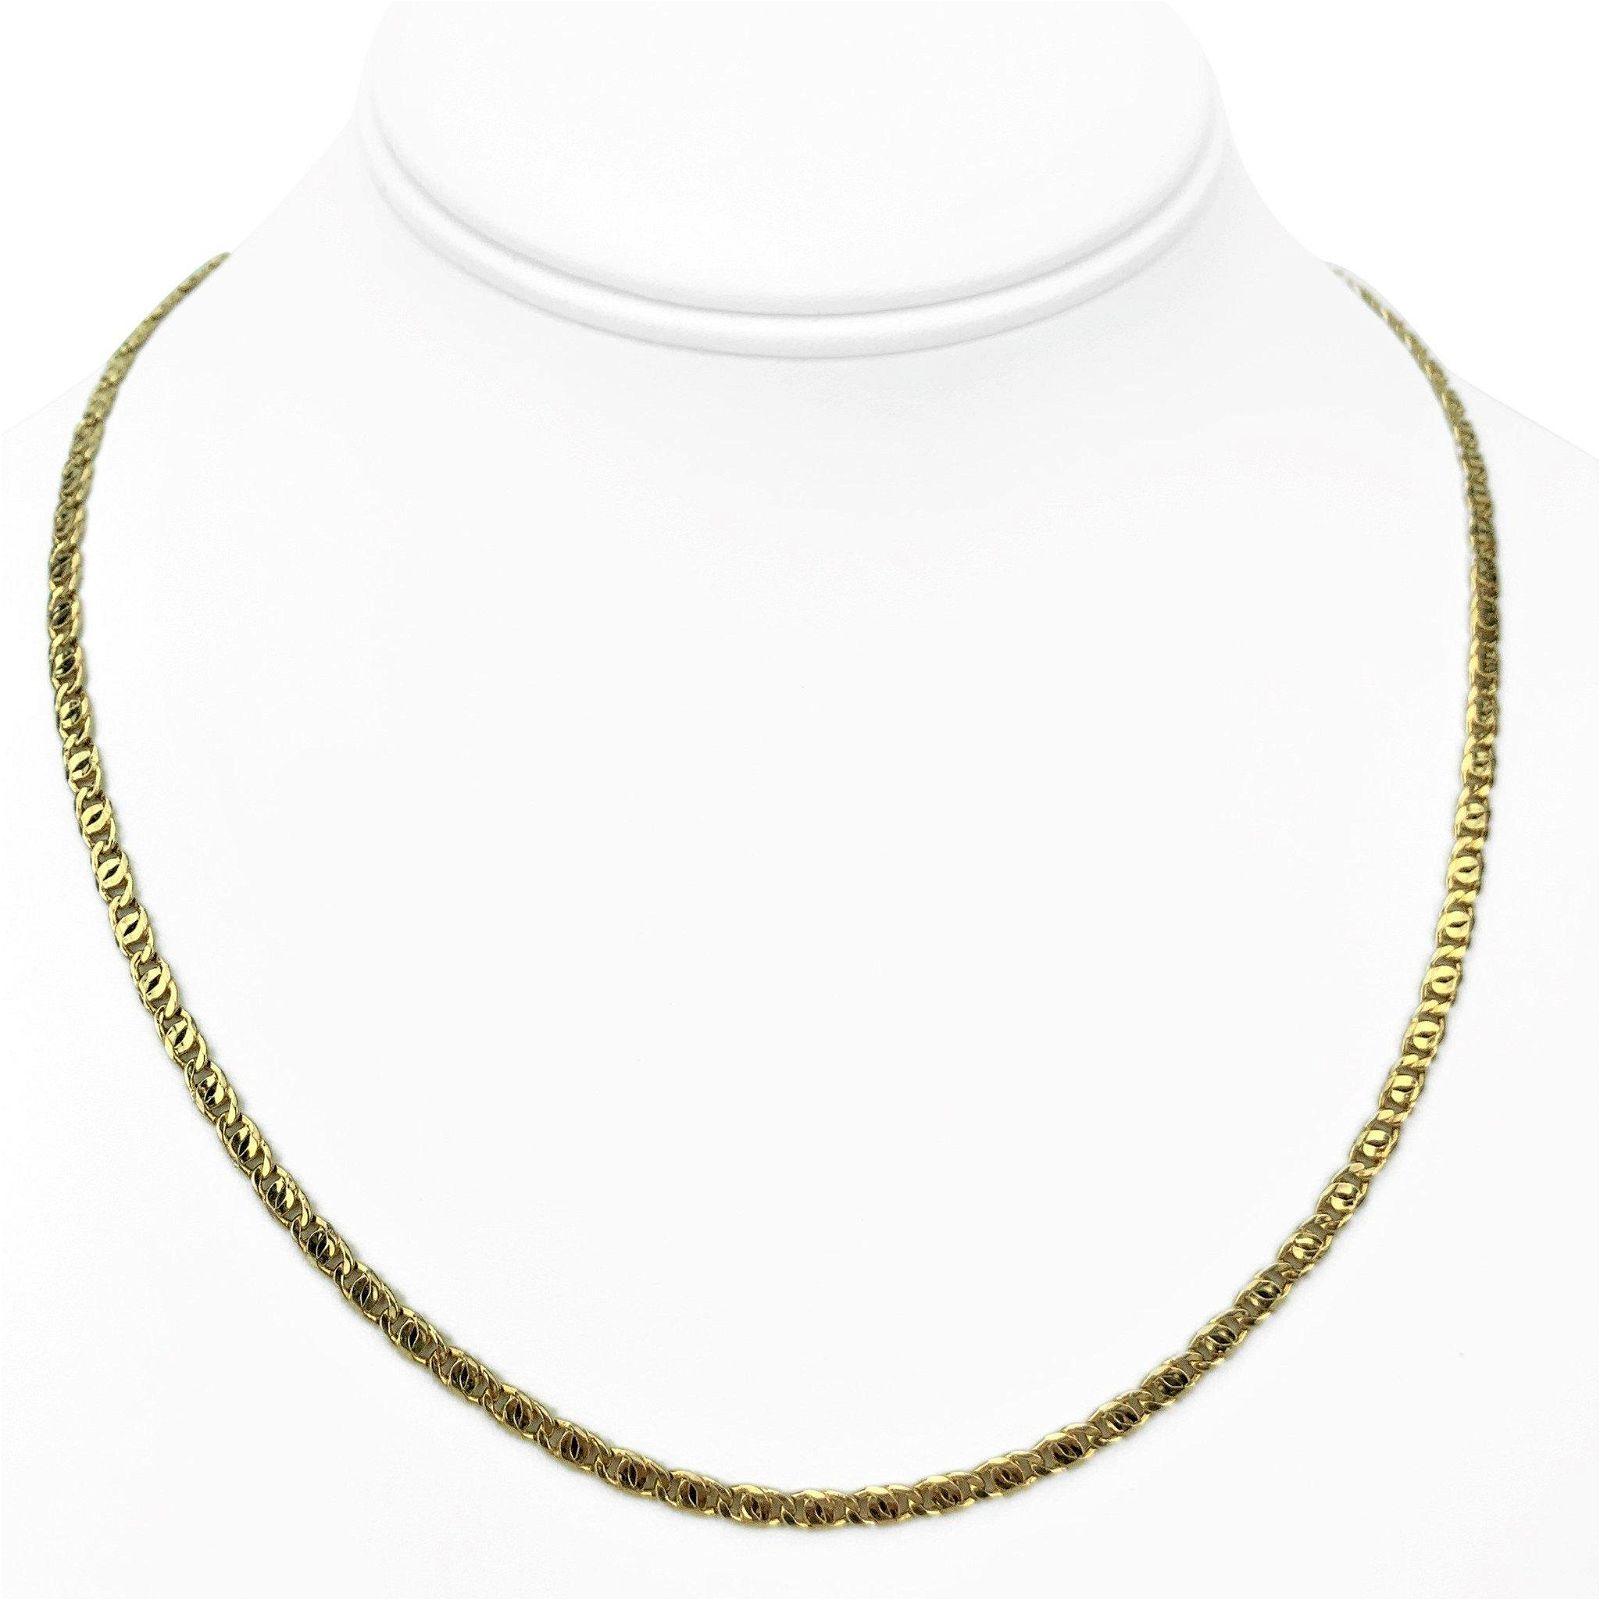 14k Yellow Gold 3.5mm Light Hollow Figure 8 Link Chain